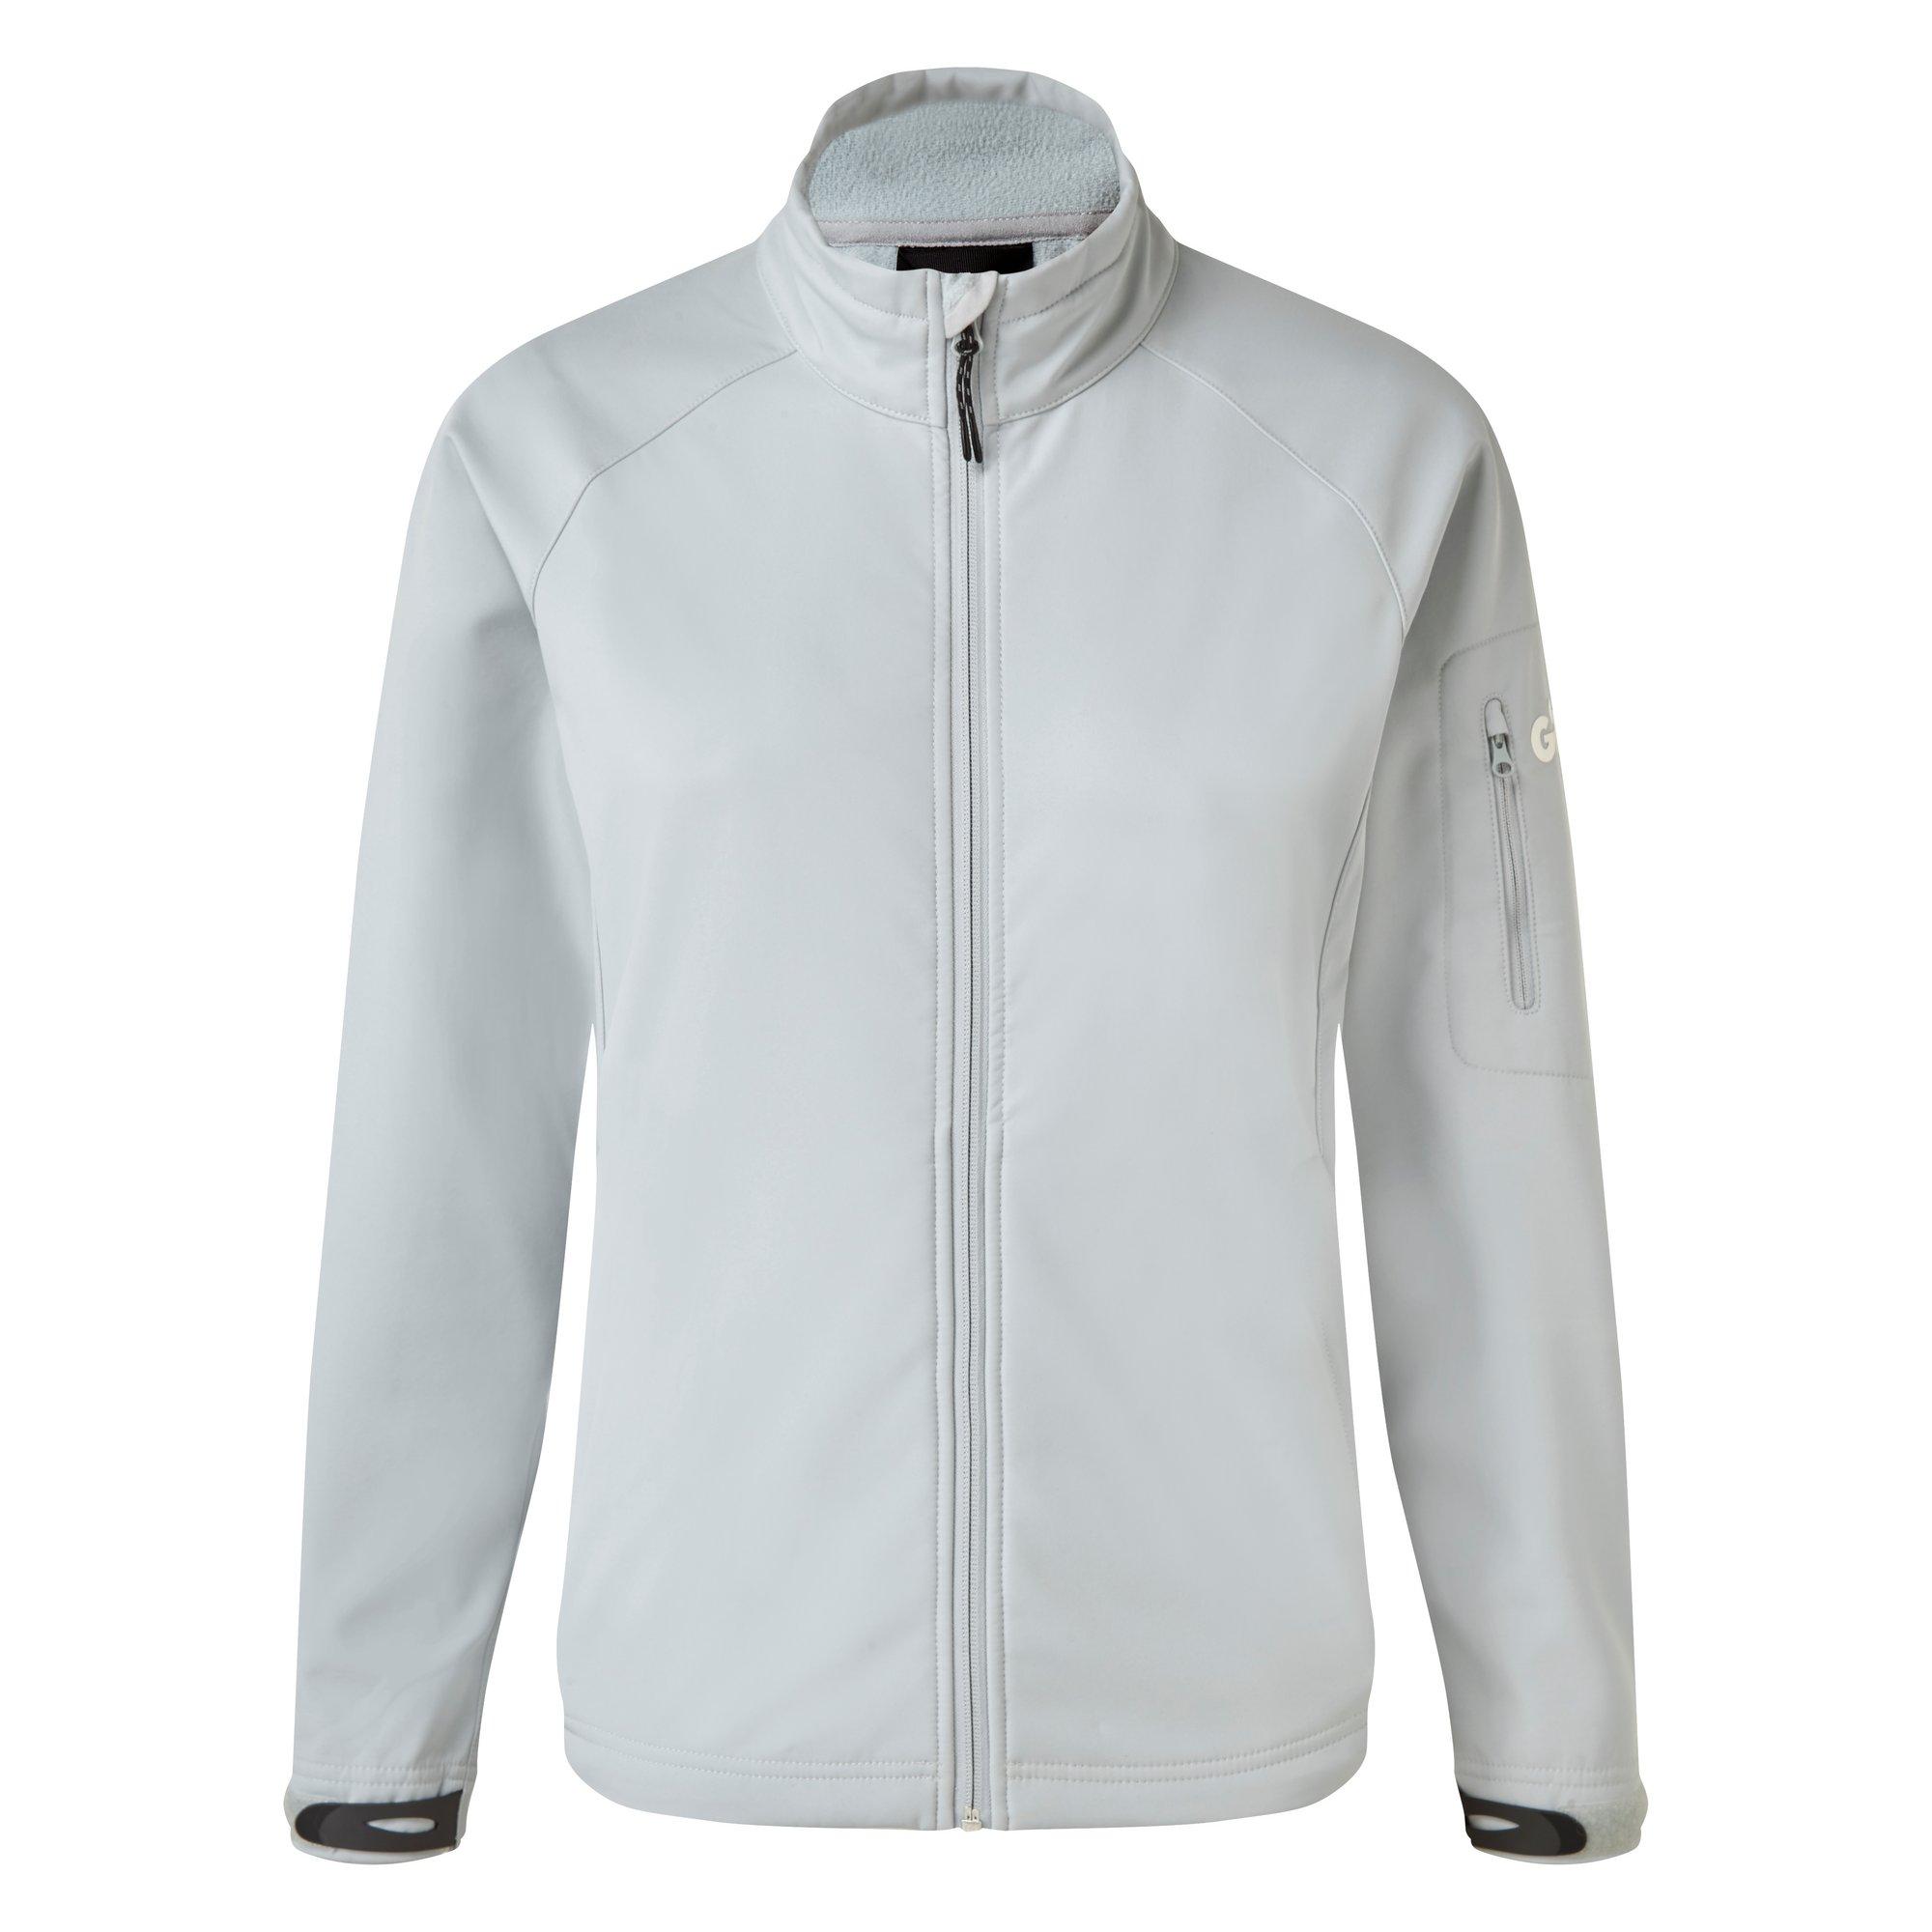 Women's Team Softshell Jacket - 1614W-GRE14-1.jpg